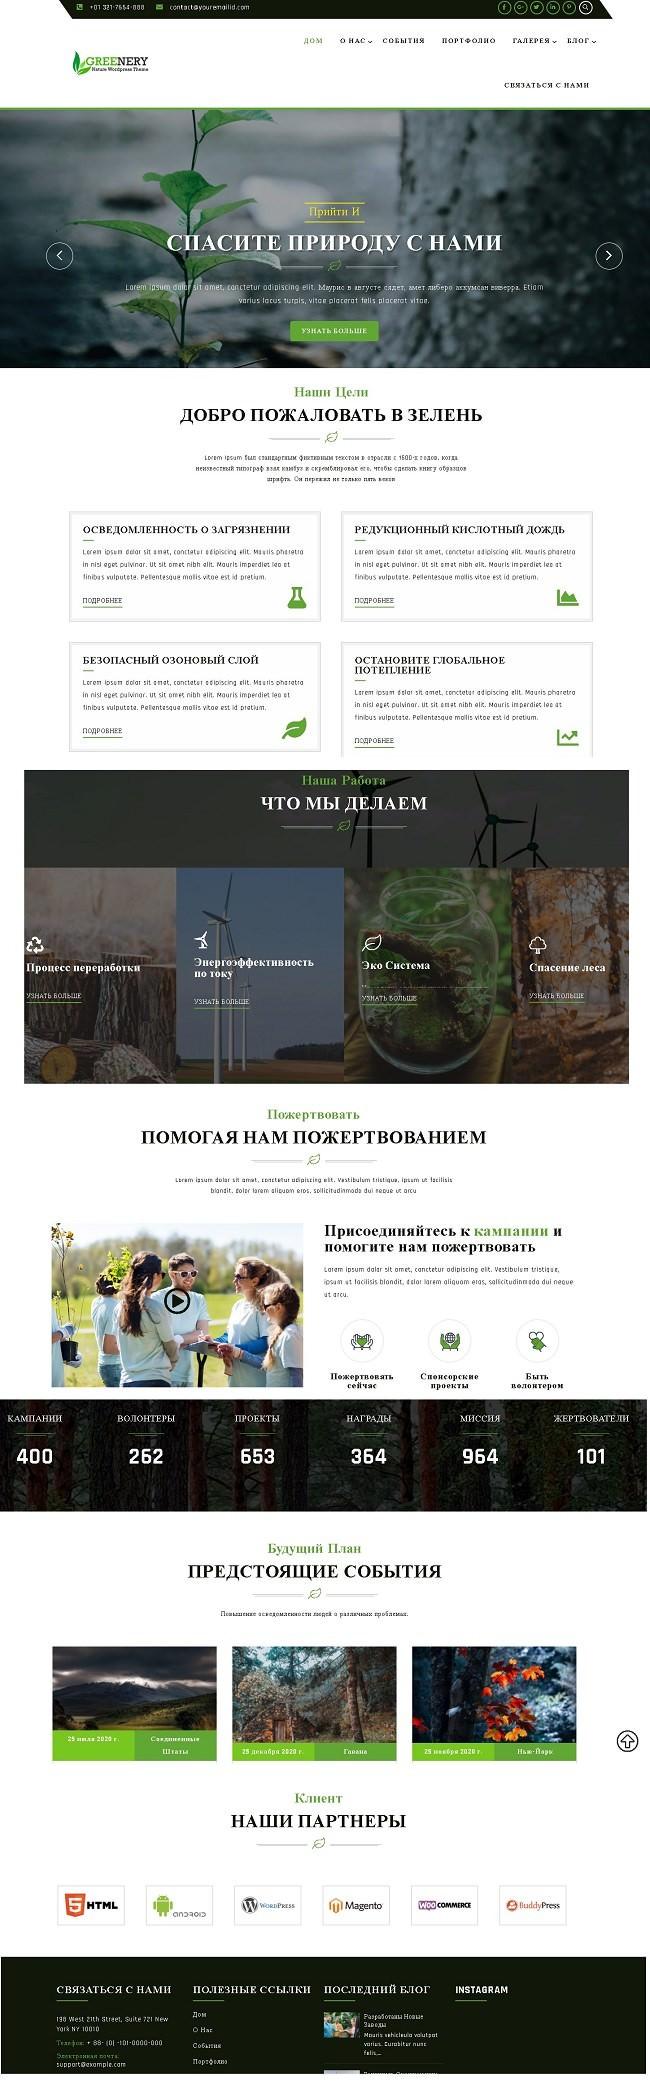 Greenery Lite русский бесплатный шаблон WordPress для садоводства